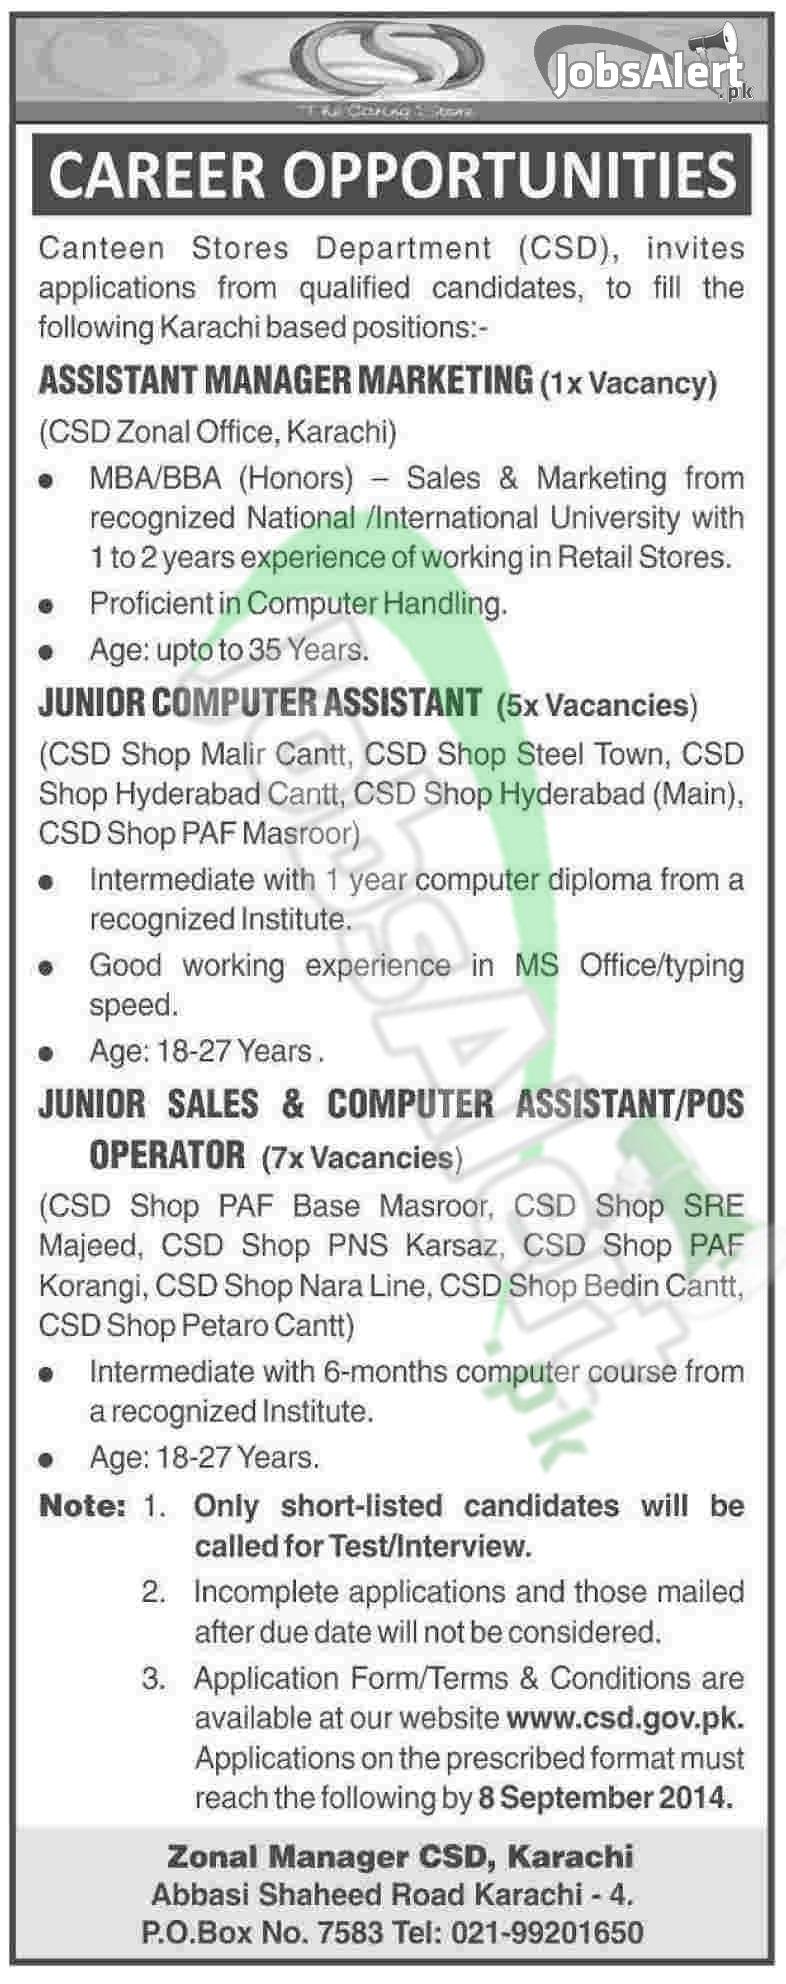 (CSD) Canteen Stores Department Karachi